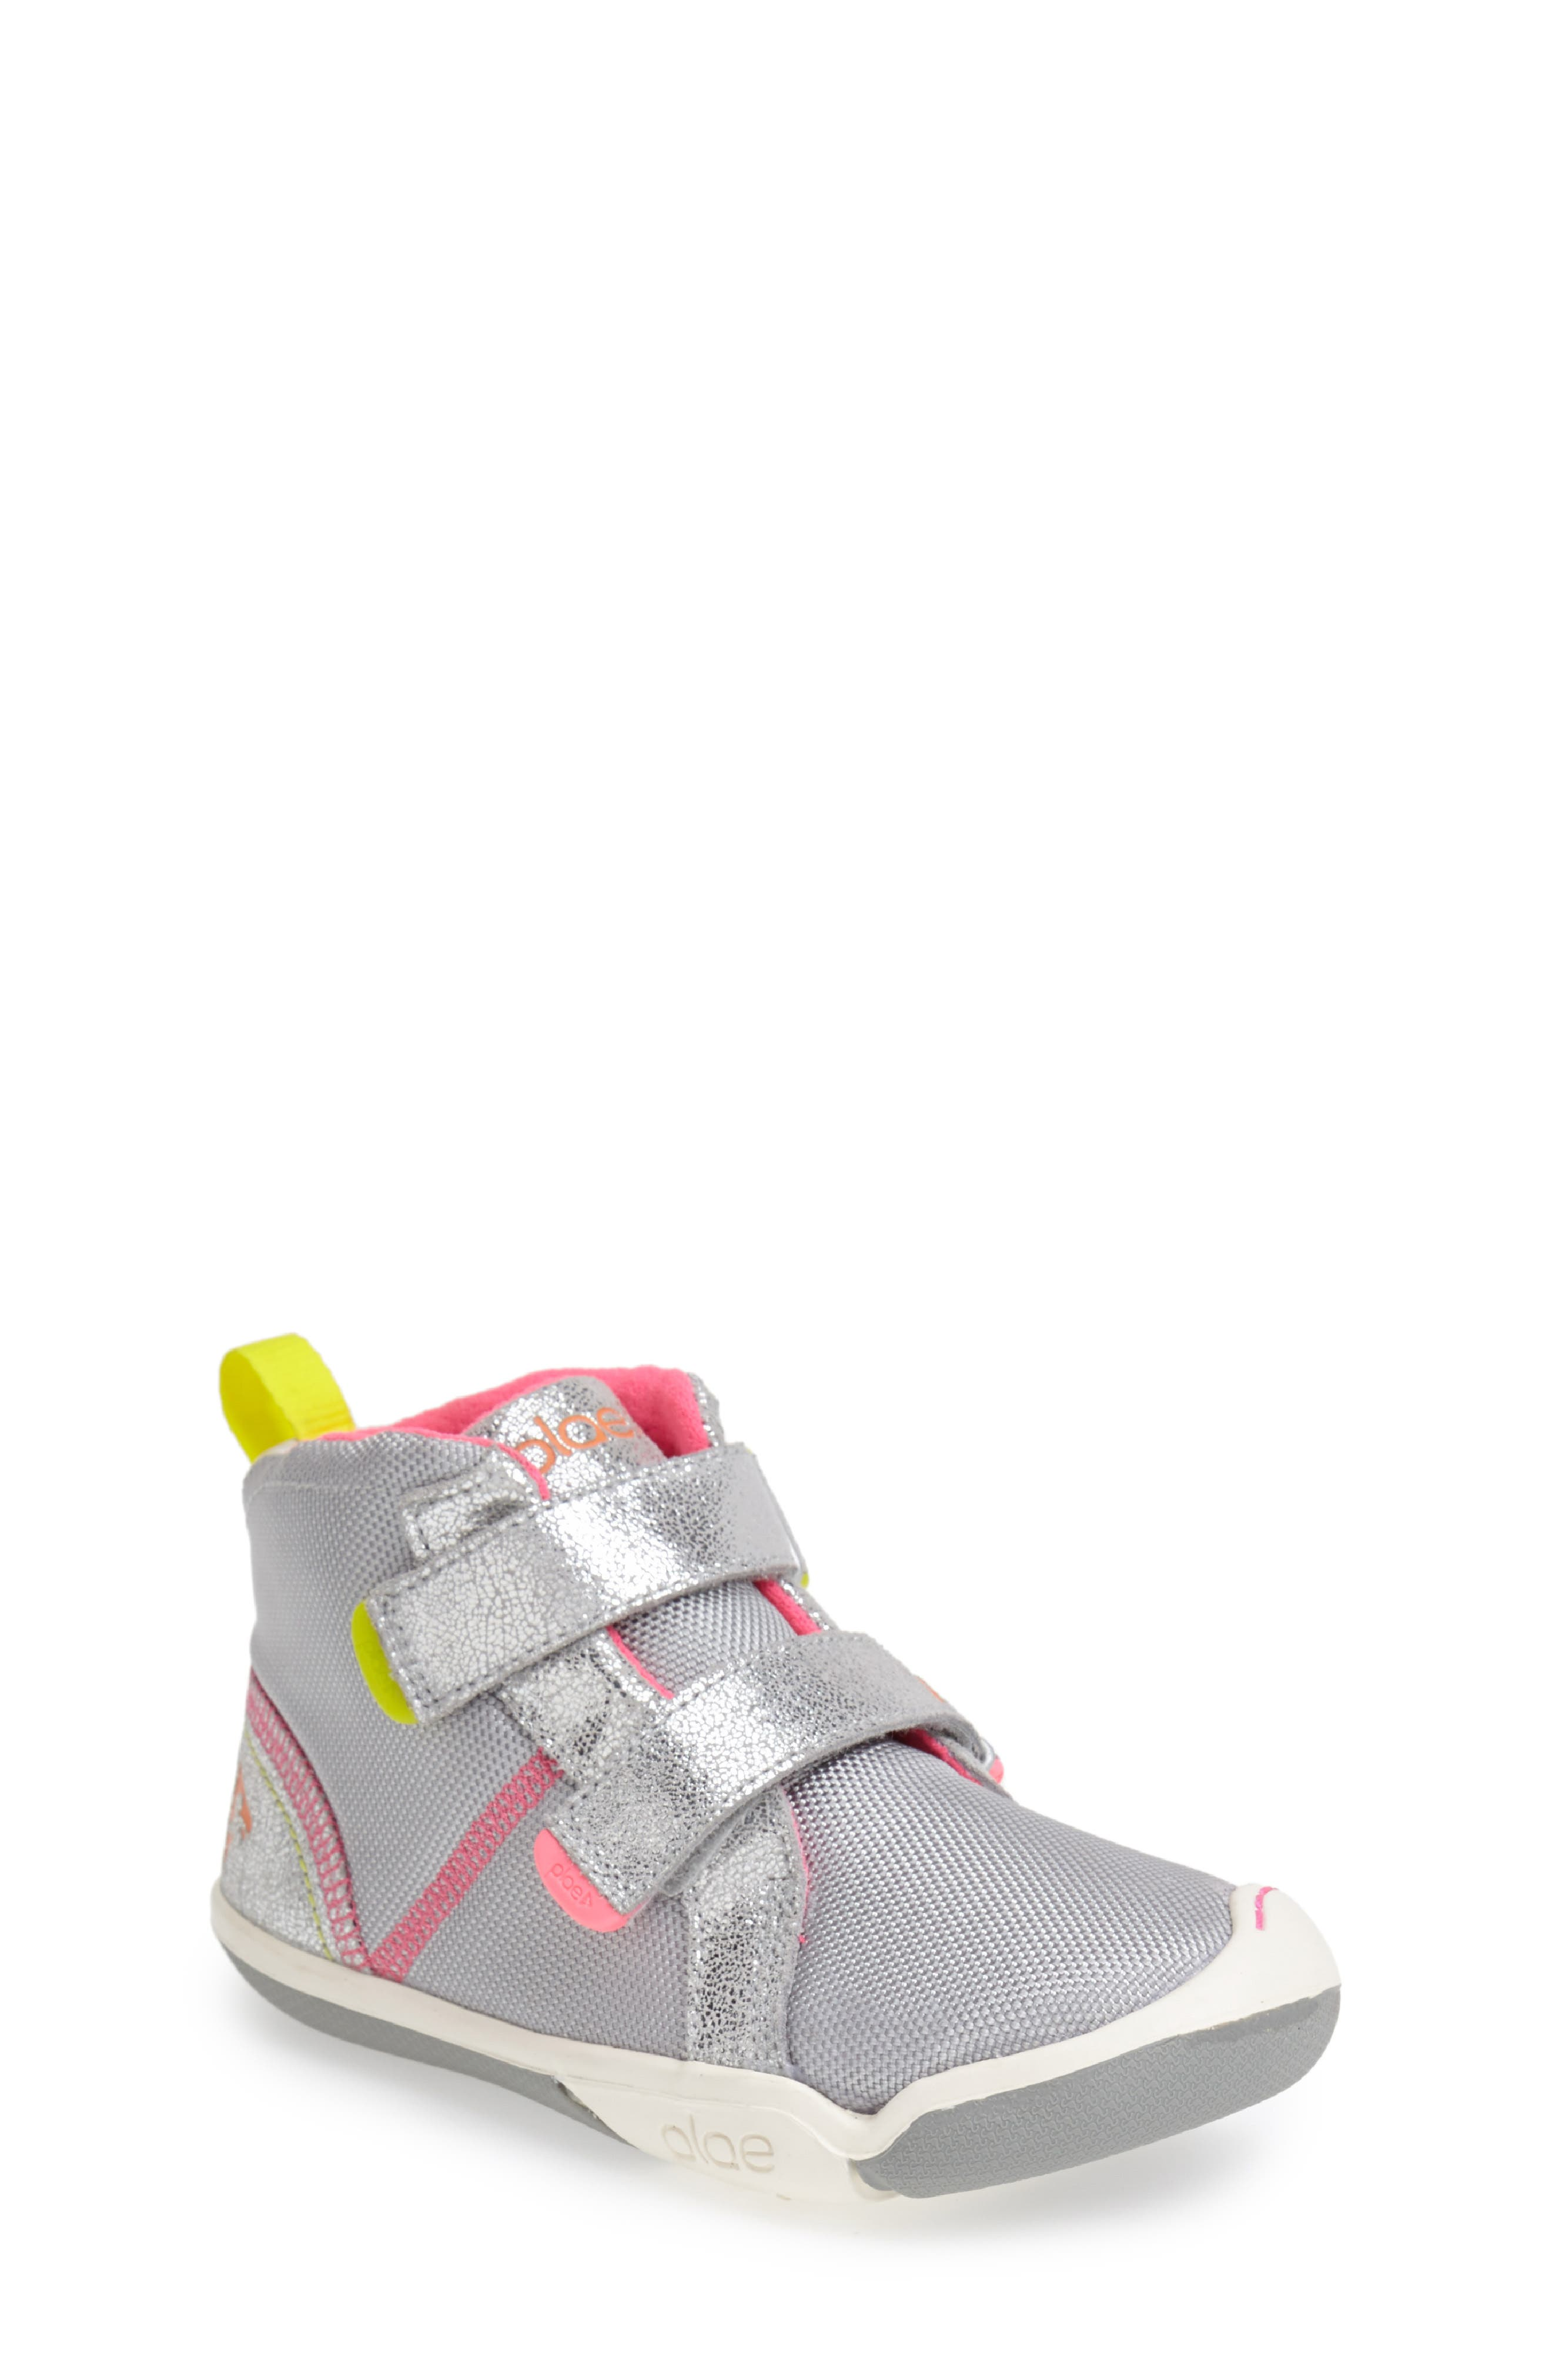 'Max' Customizable High Top Sneaker,                             Alternate thumbnail 6, color,                             040